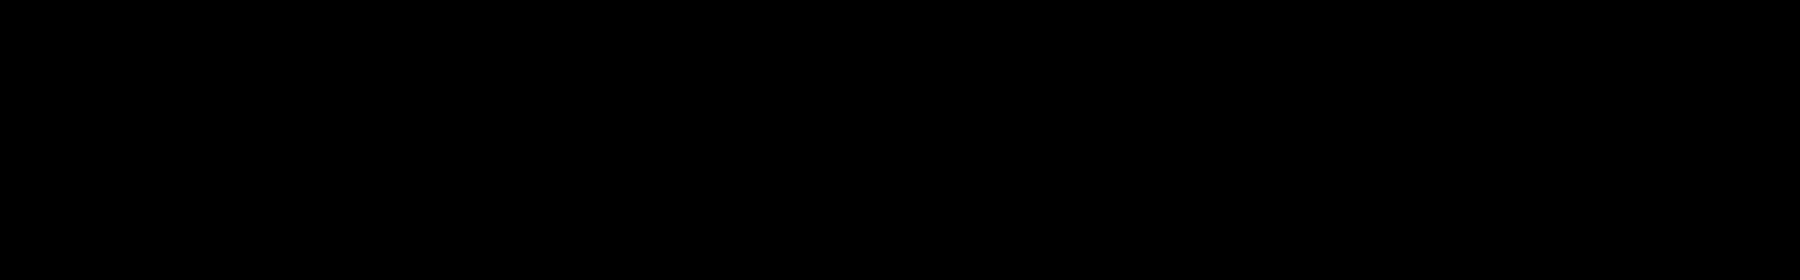 Melodic Lo-Fi audio waveform